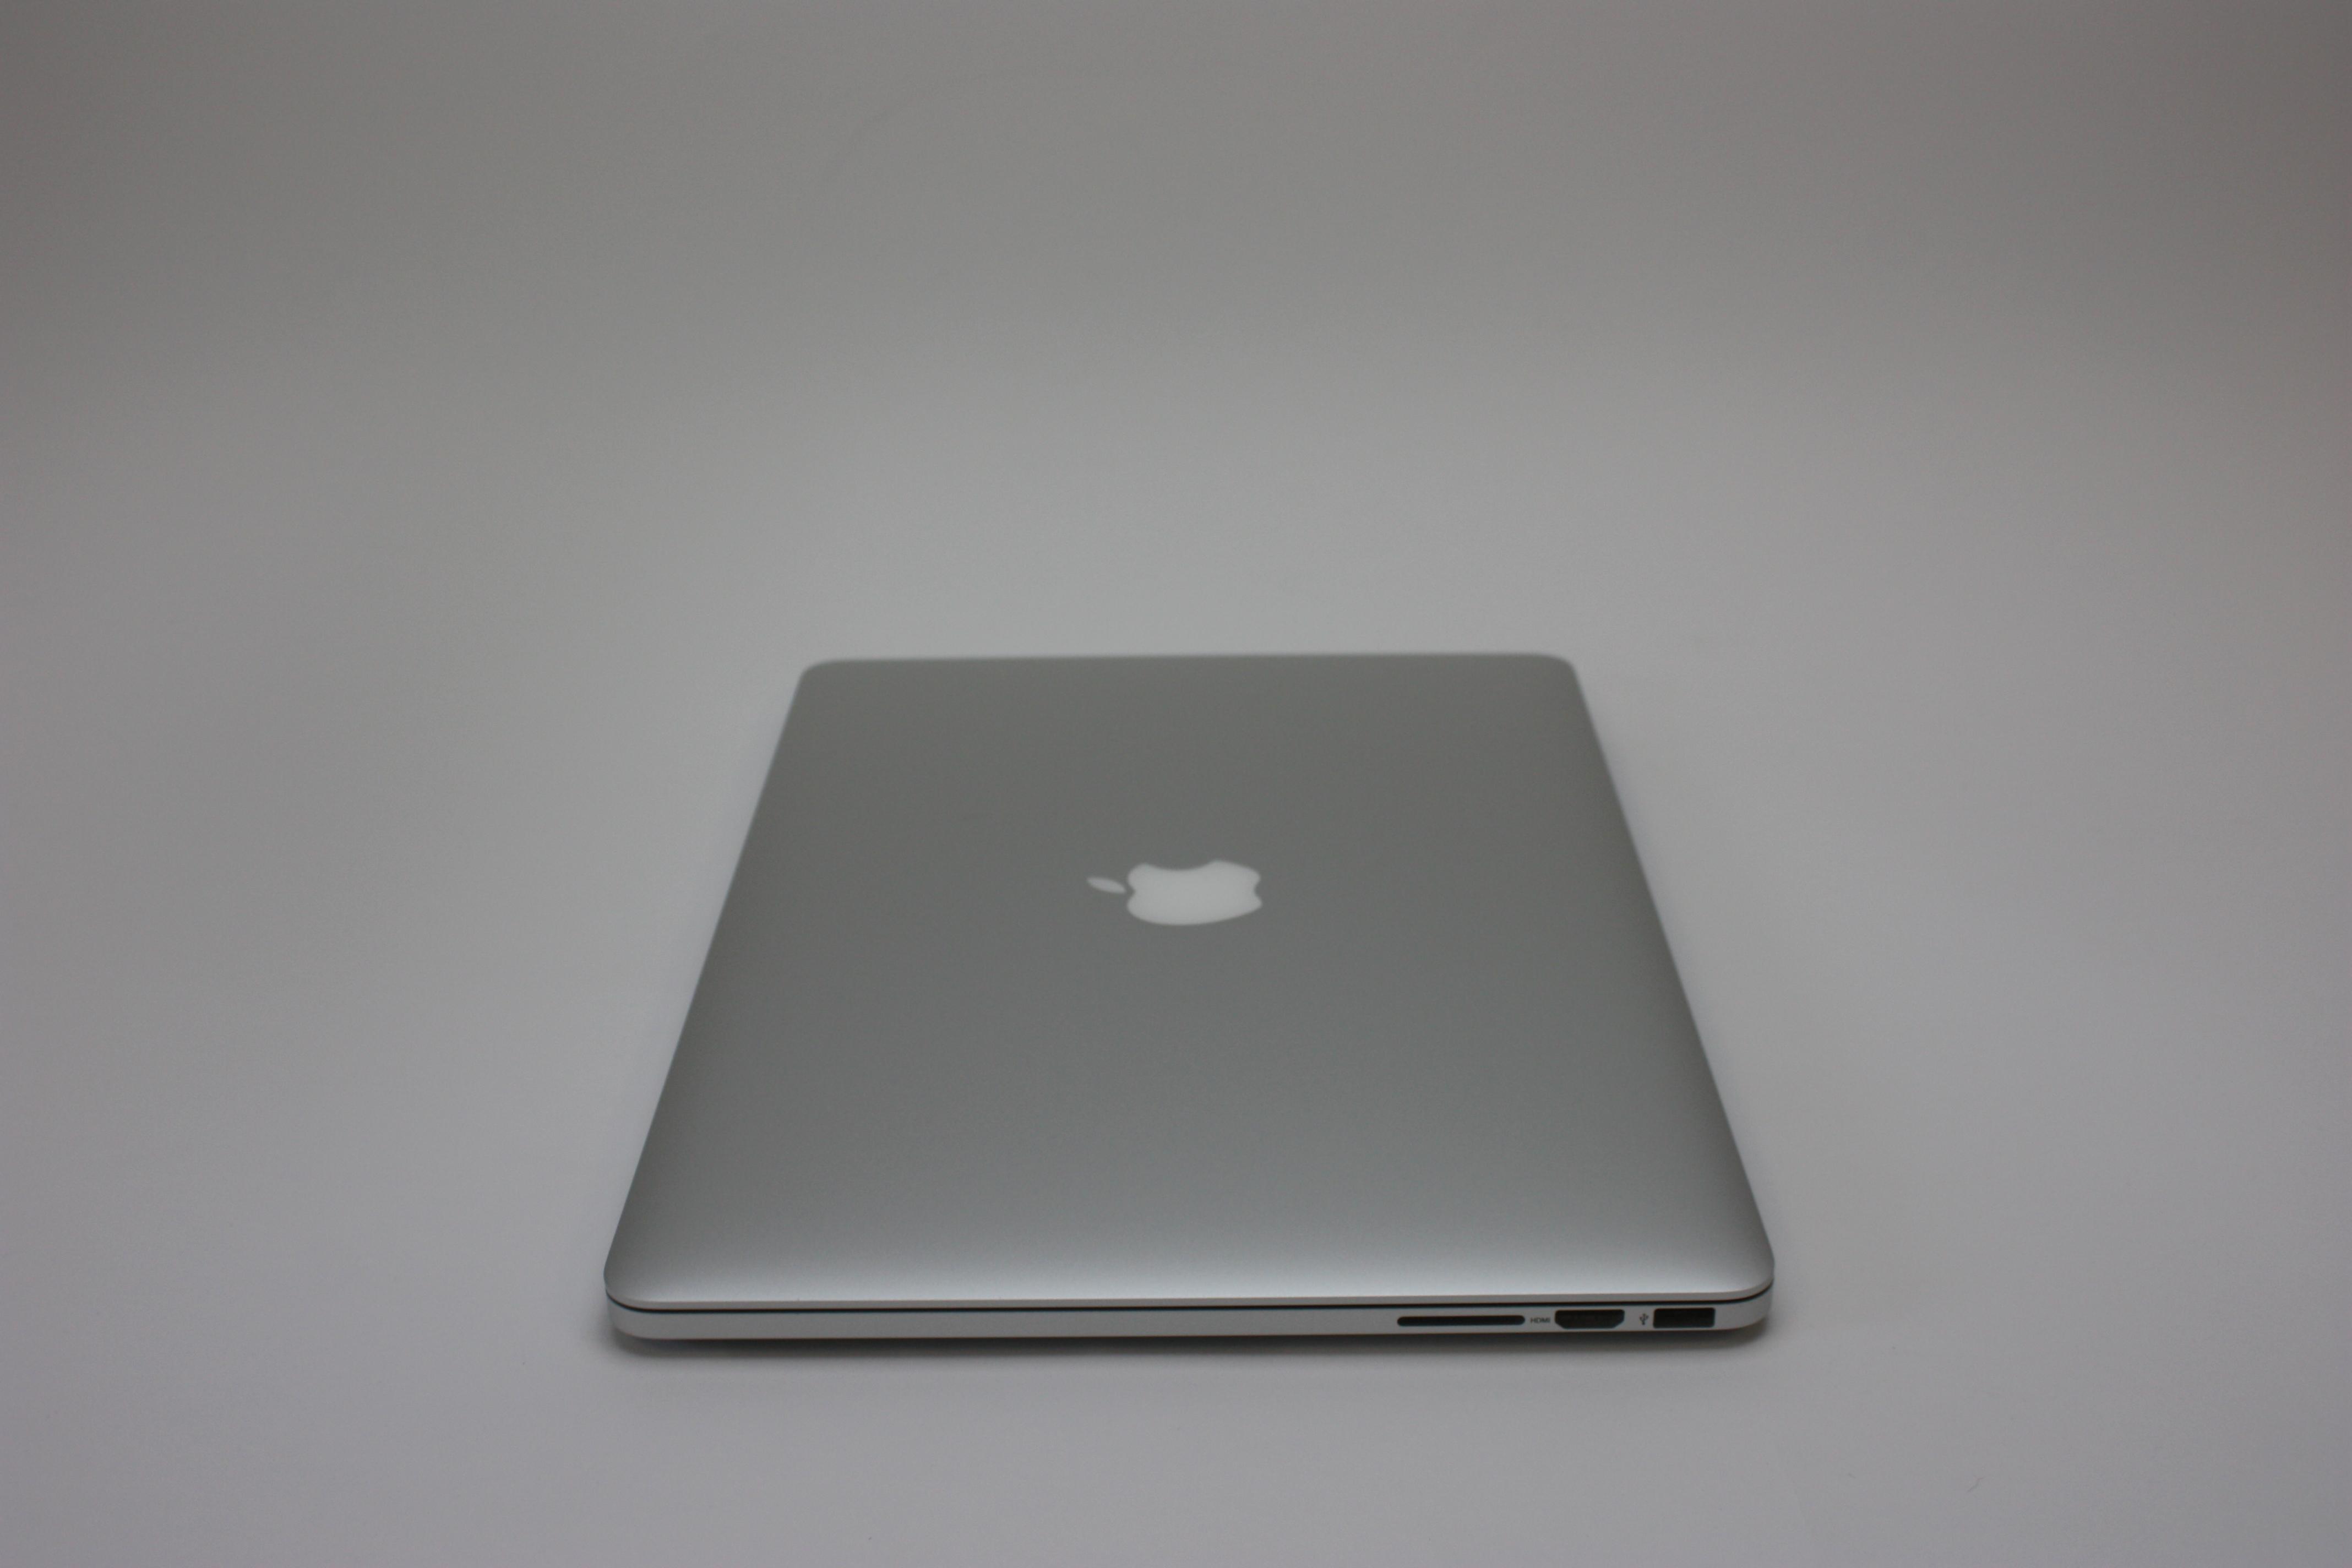 MacBook Pro 15-inch Retina, 2.2 GHz Intel Core i7, 16 GB 1600 MHz DDR3, 256 GB Flash Storage, image 7